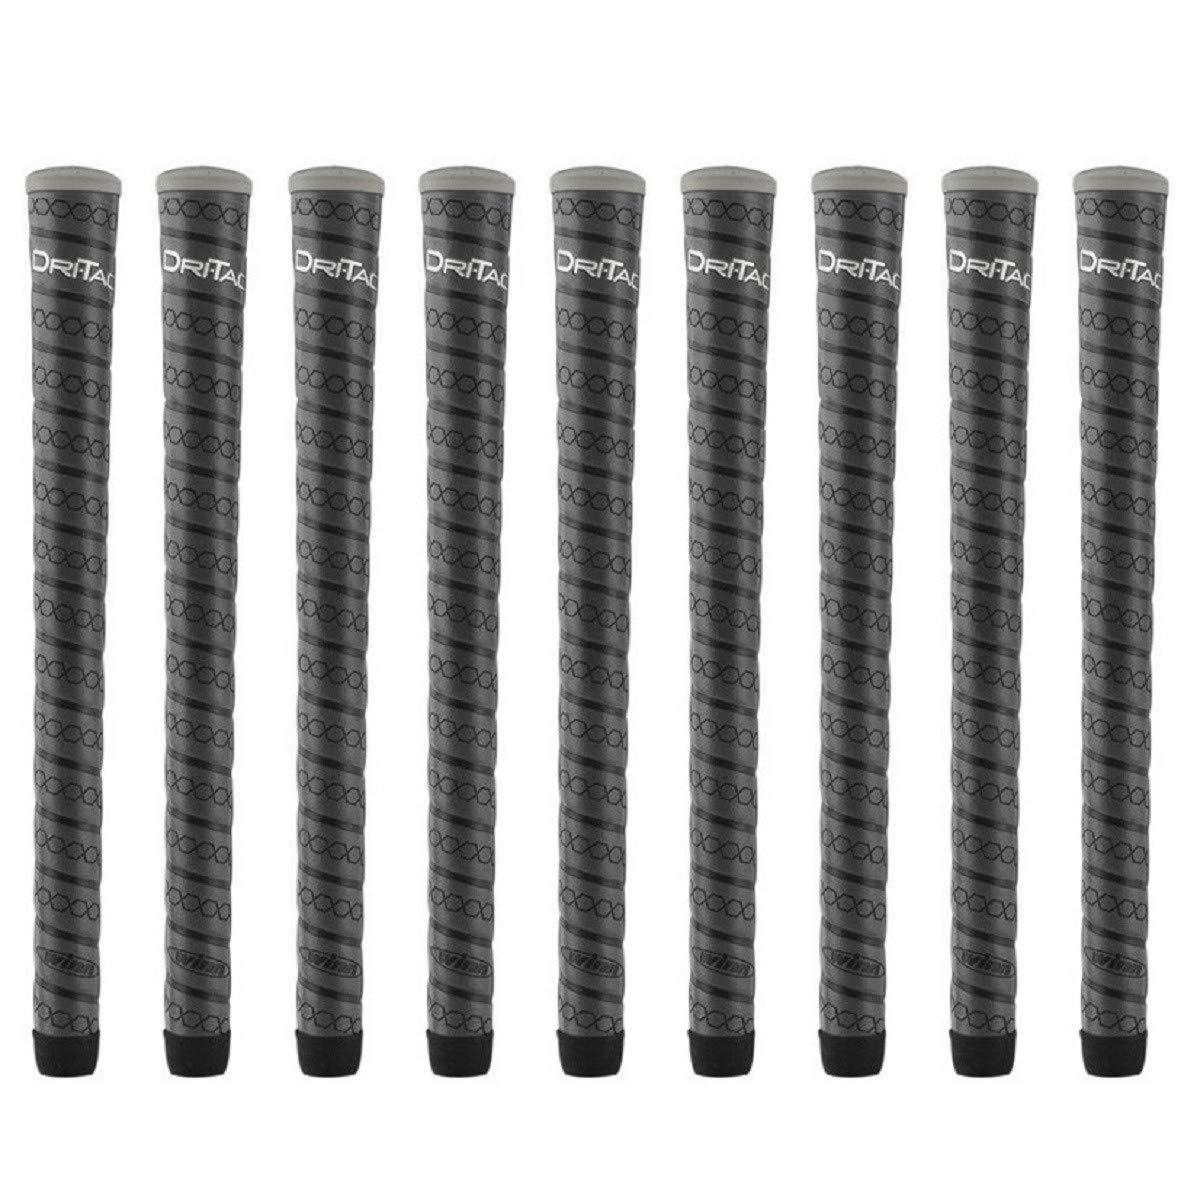 Winn Dri-Tac Wrap Oversize (+1/8'') - 9 Piece Golf Grip Bundle